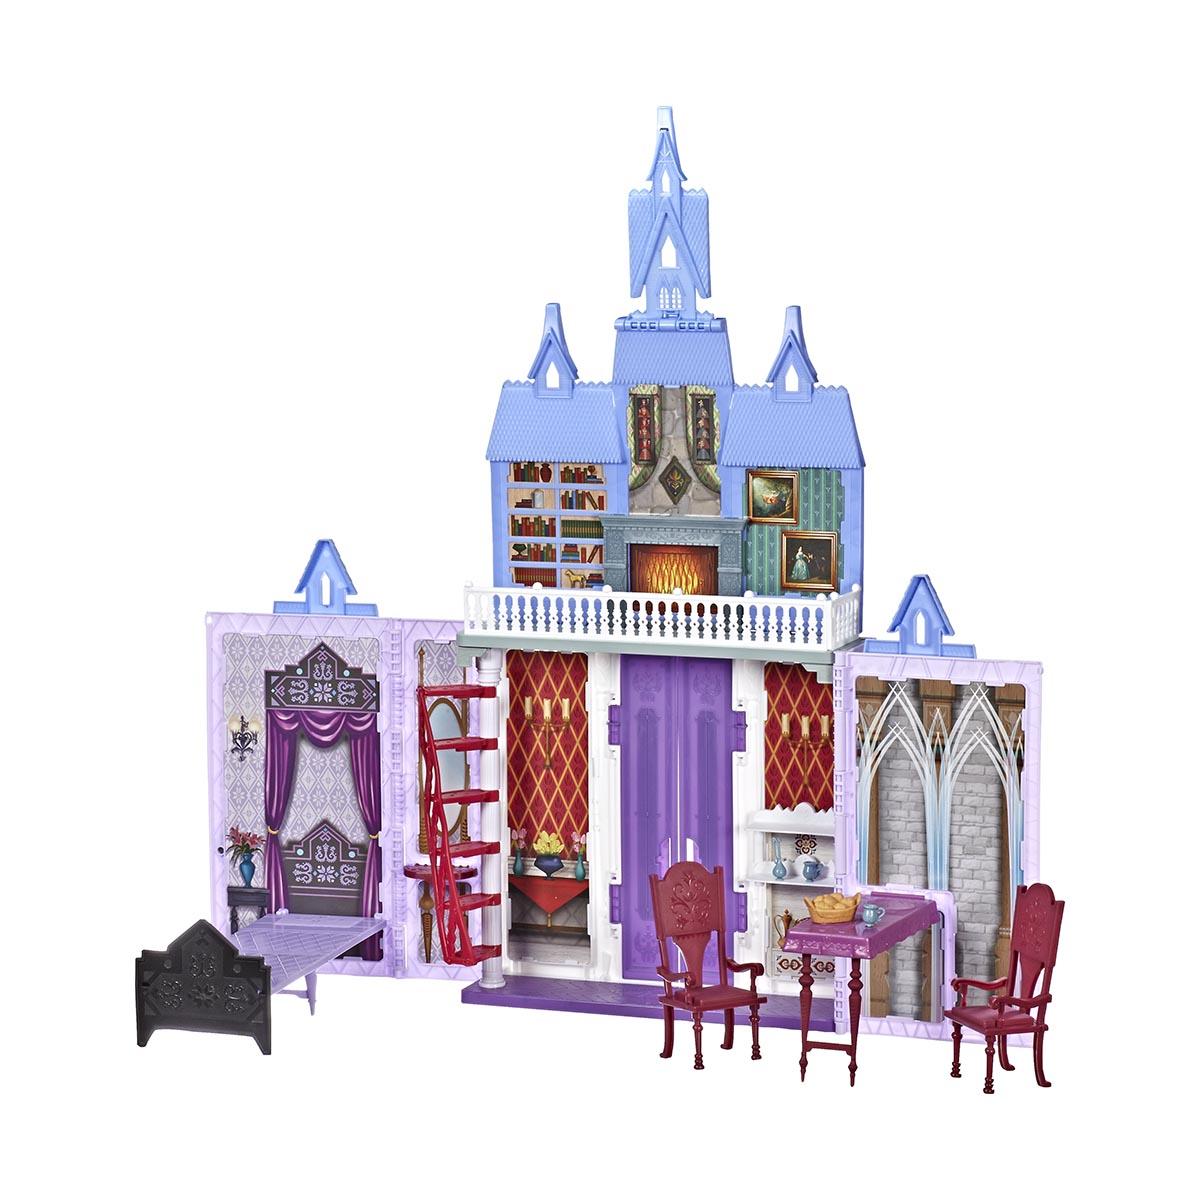 Set de joaca Castel, Disney Frozen 2